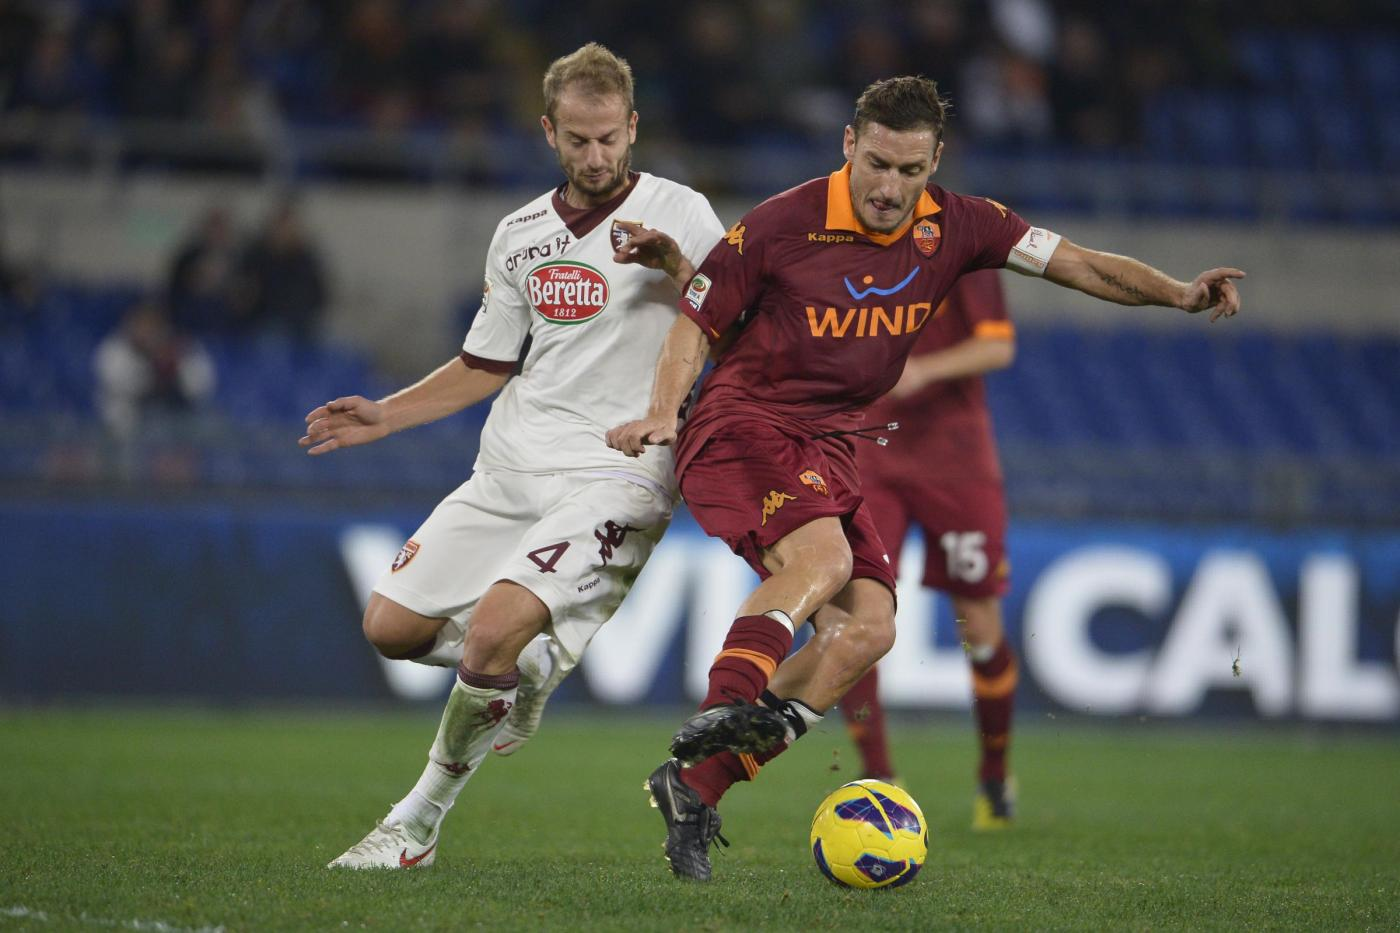 Roma-Torino wiziwig streaming gratis: diretta Sky live oggi serie A